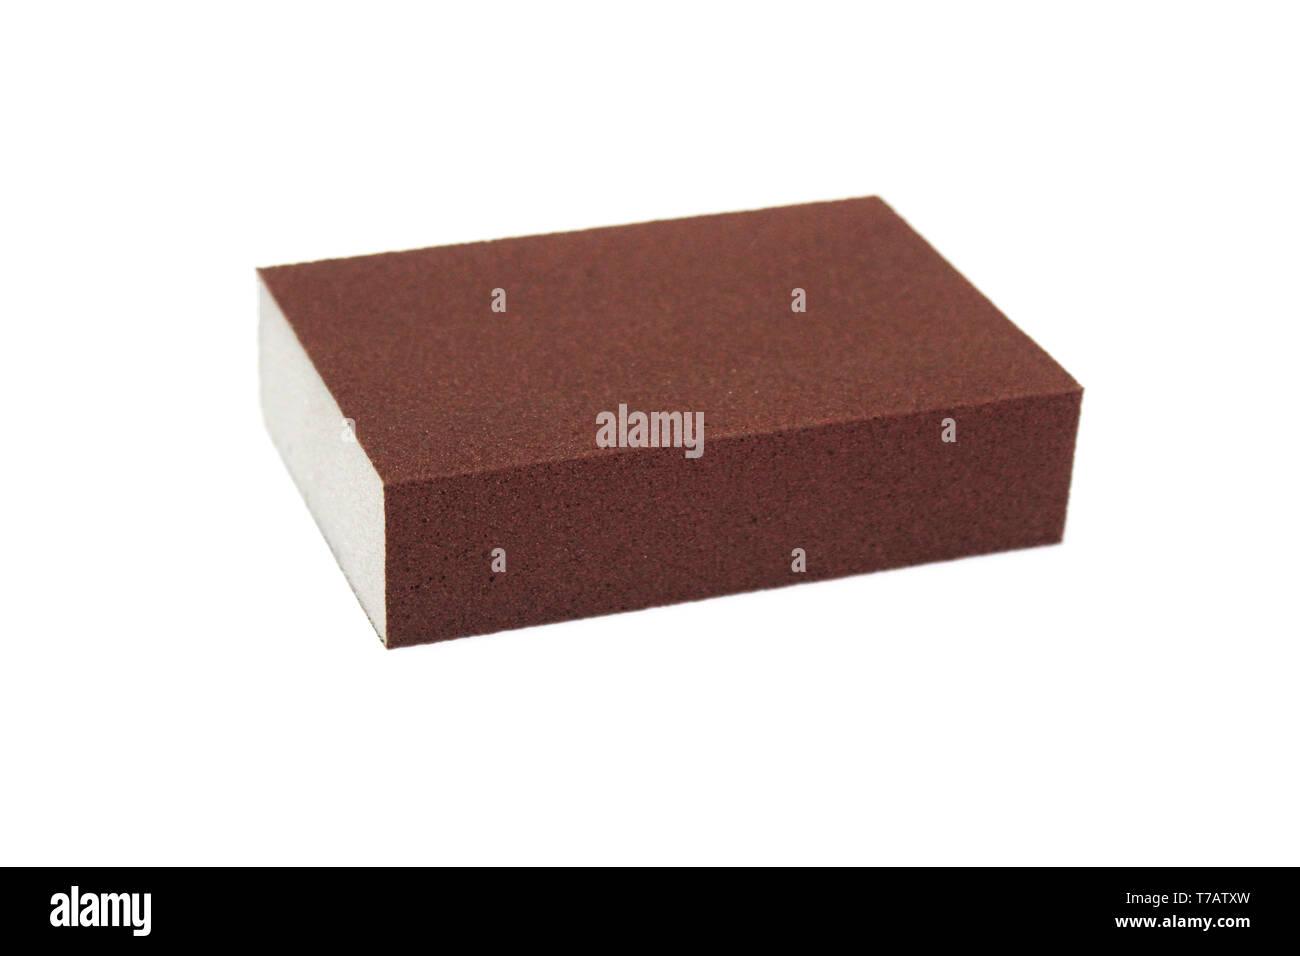 Isolated sanding block sponge over white background - Stock Image